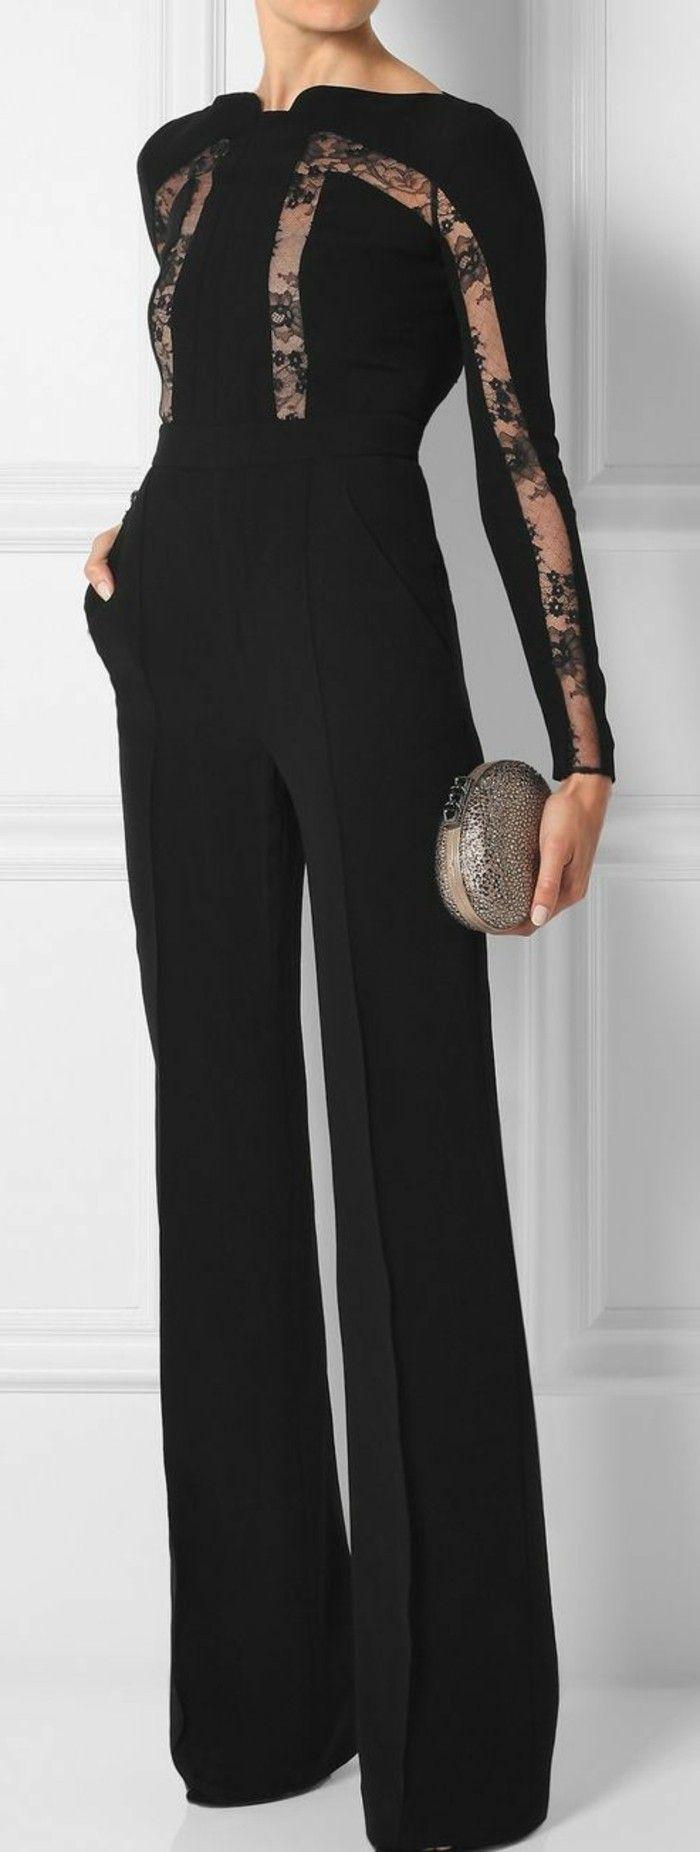 die besten 25 elegante damenmode ideen auf pinterest business outfit damen jeans elegantes. Black Bedroom Furniture Sets. Home Design Ideas